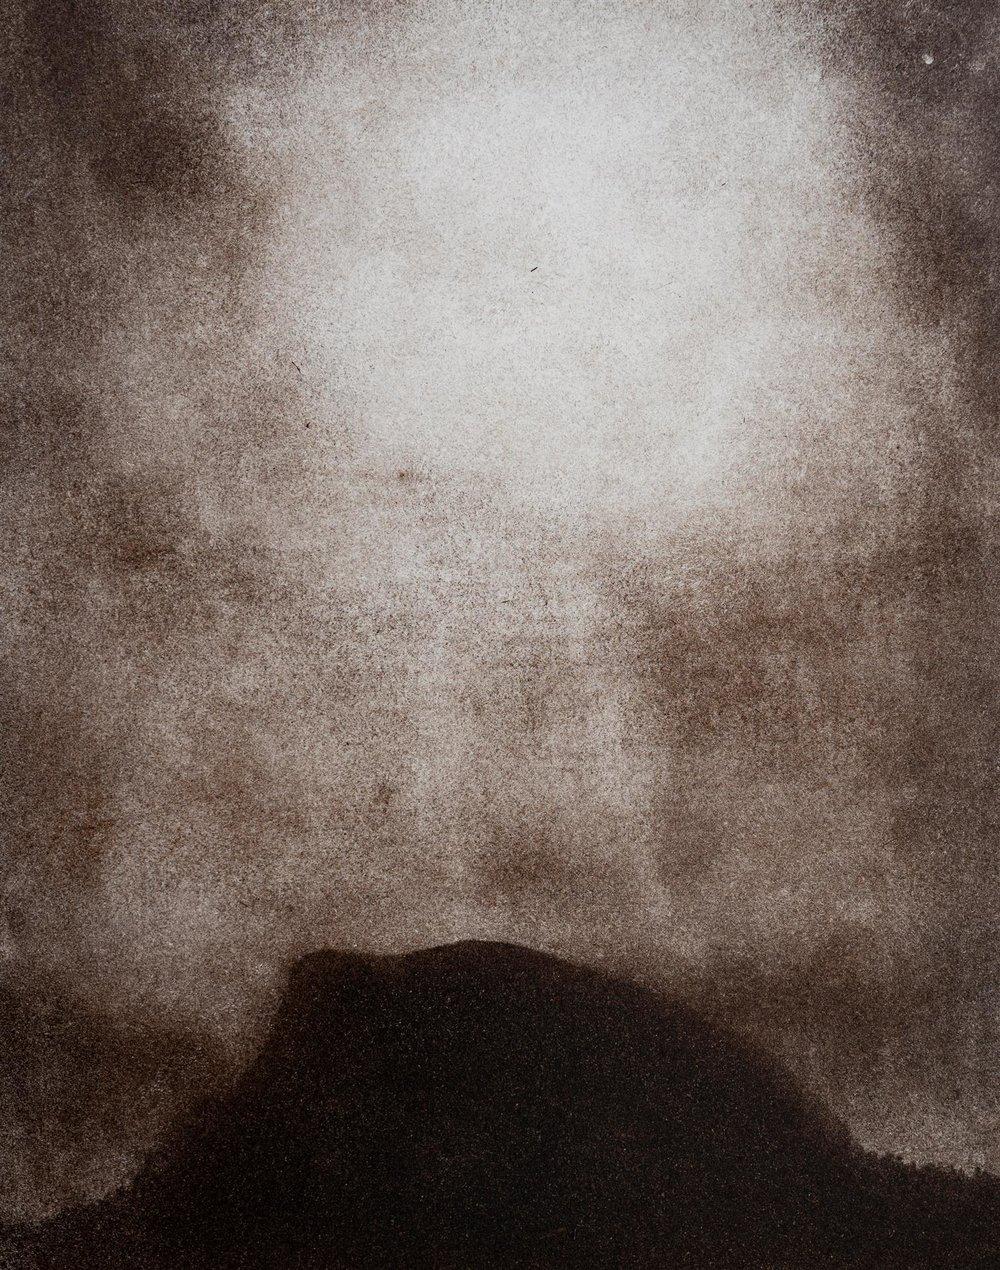 Moon and Clouds, Marek Matusz